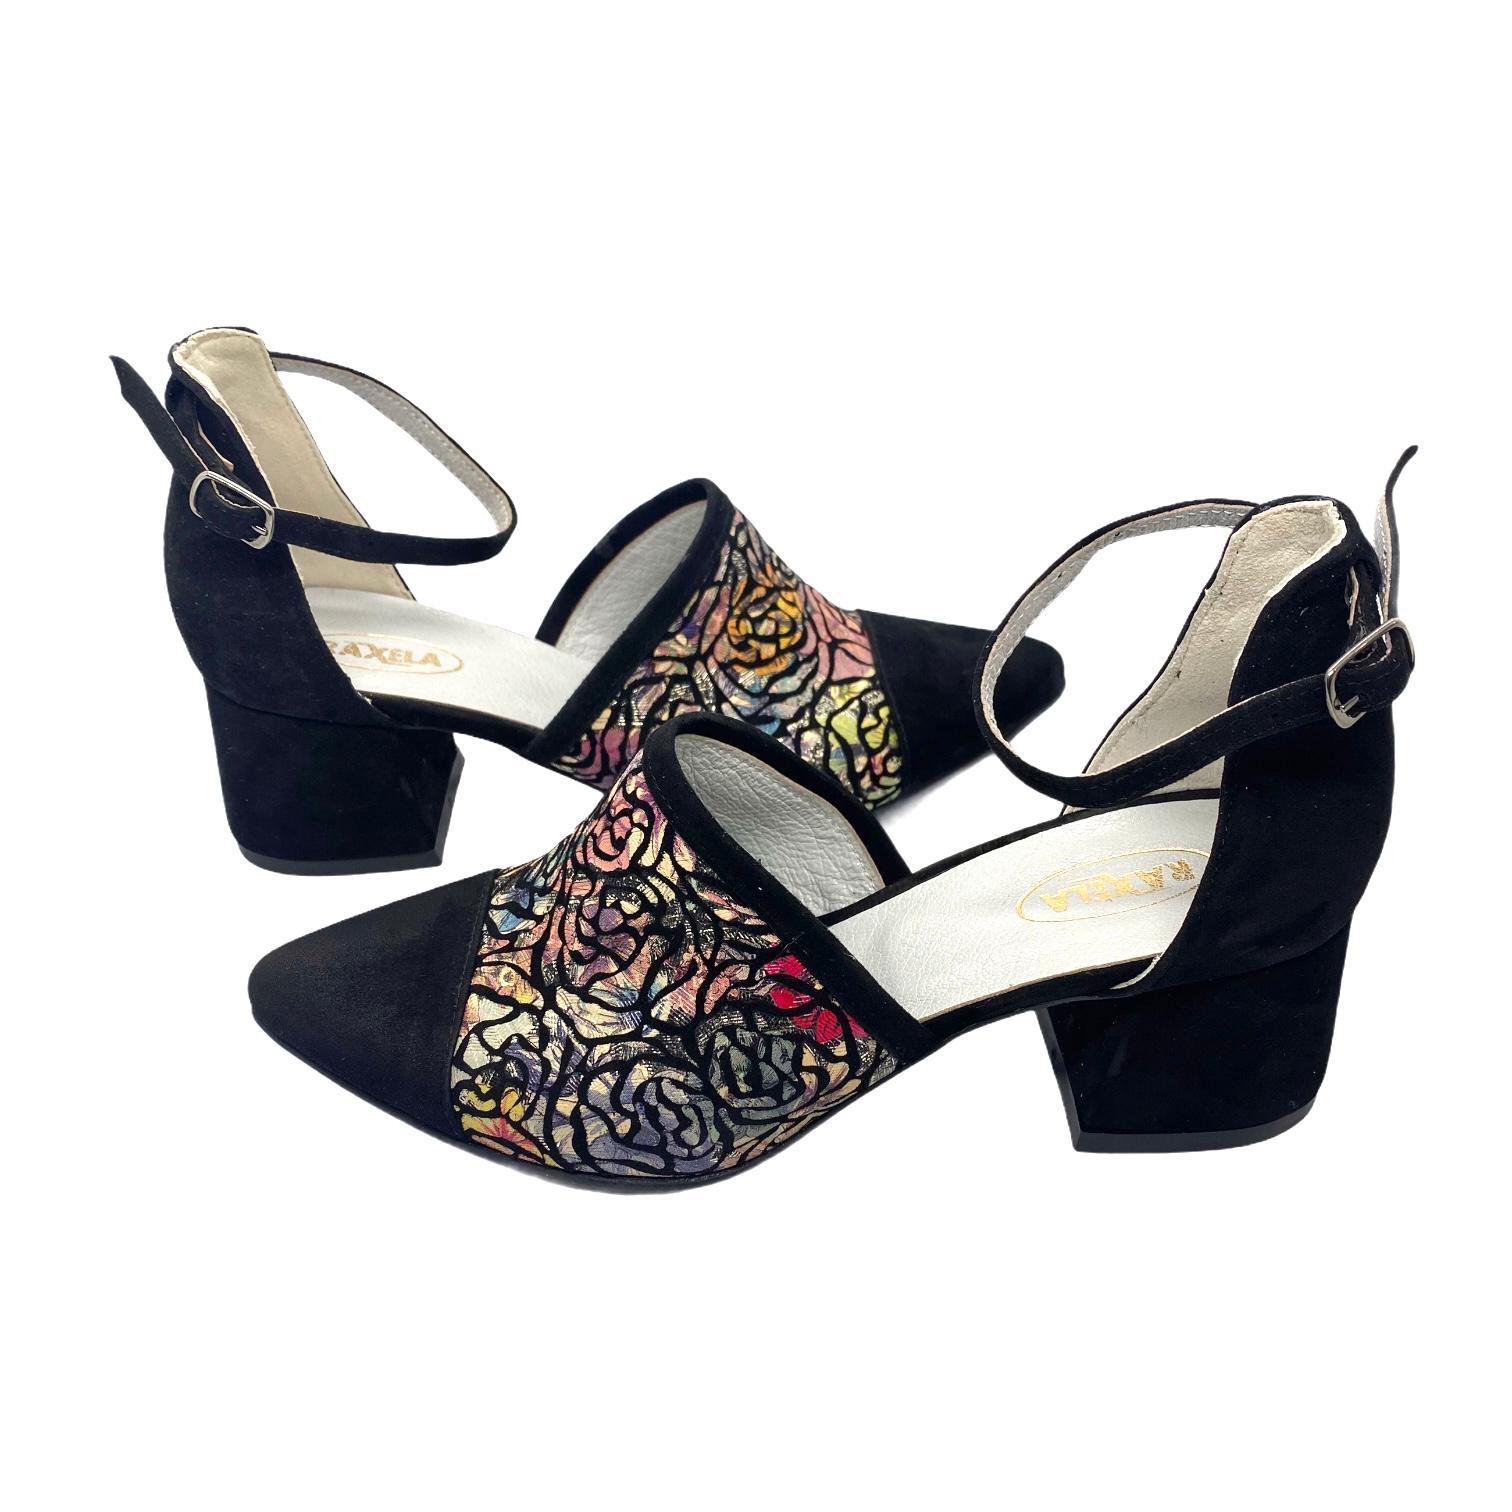 Pantofi decupati negri cu model floral colorat